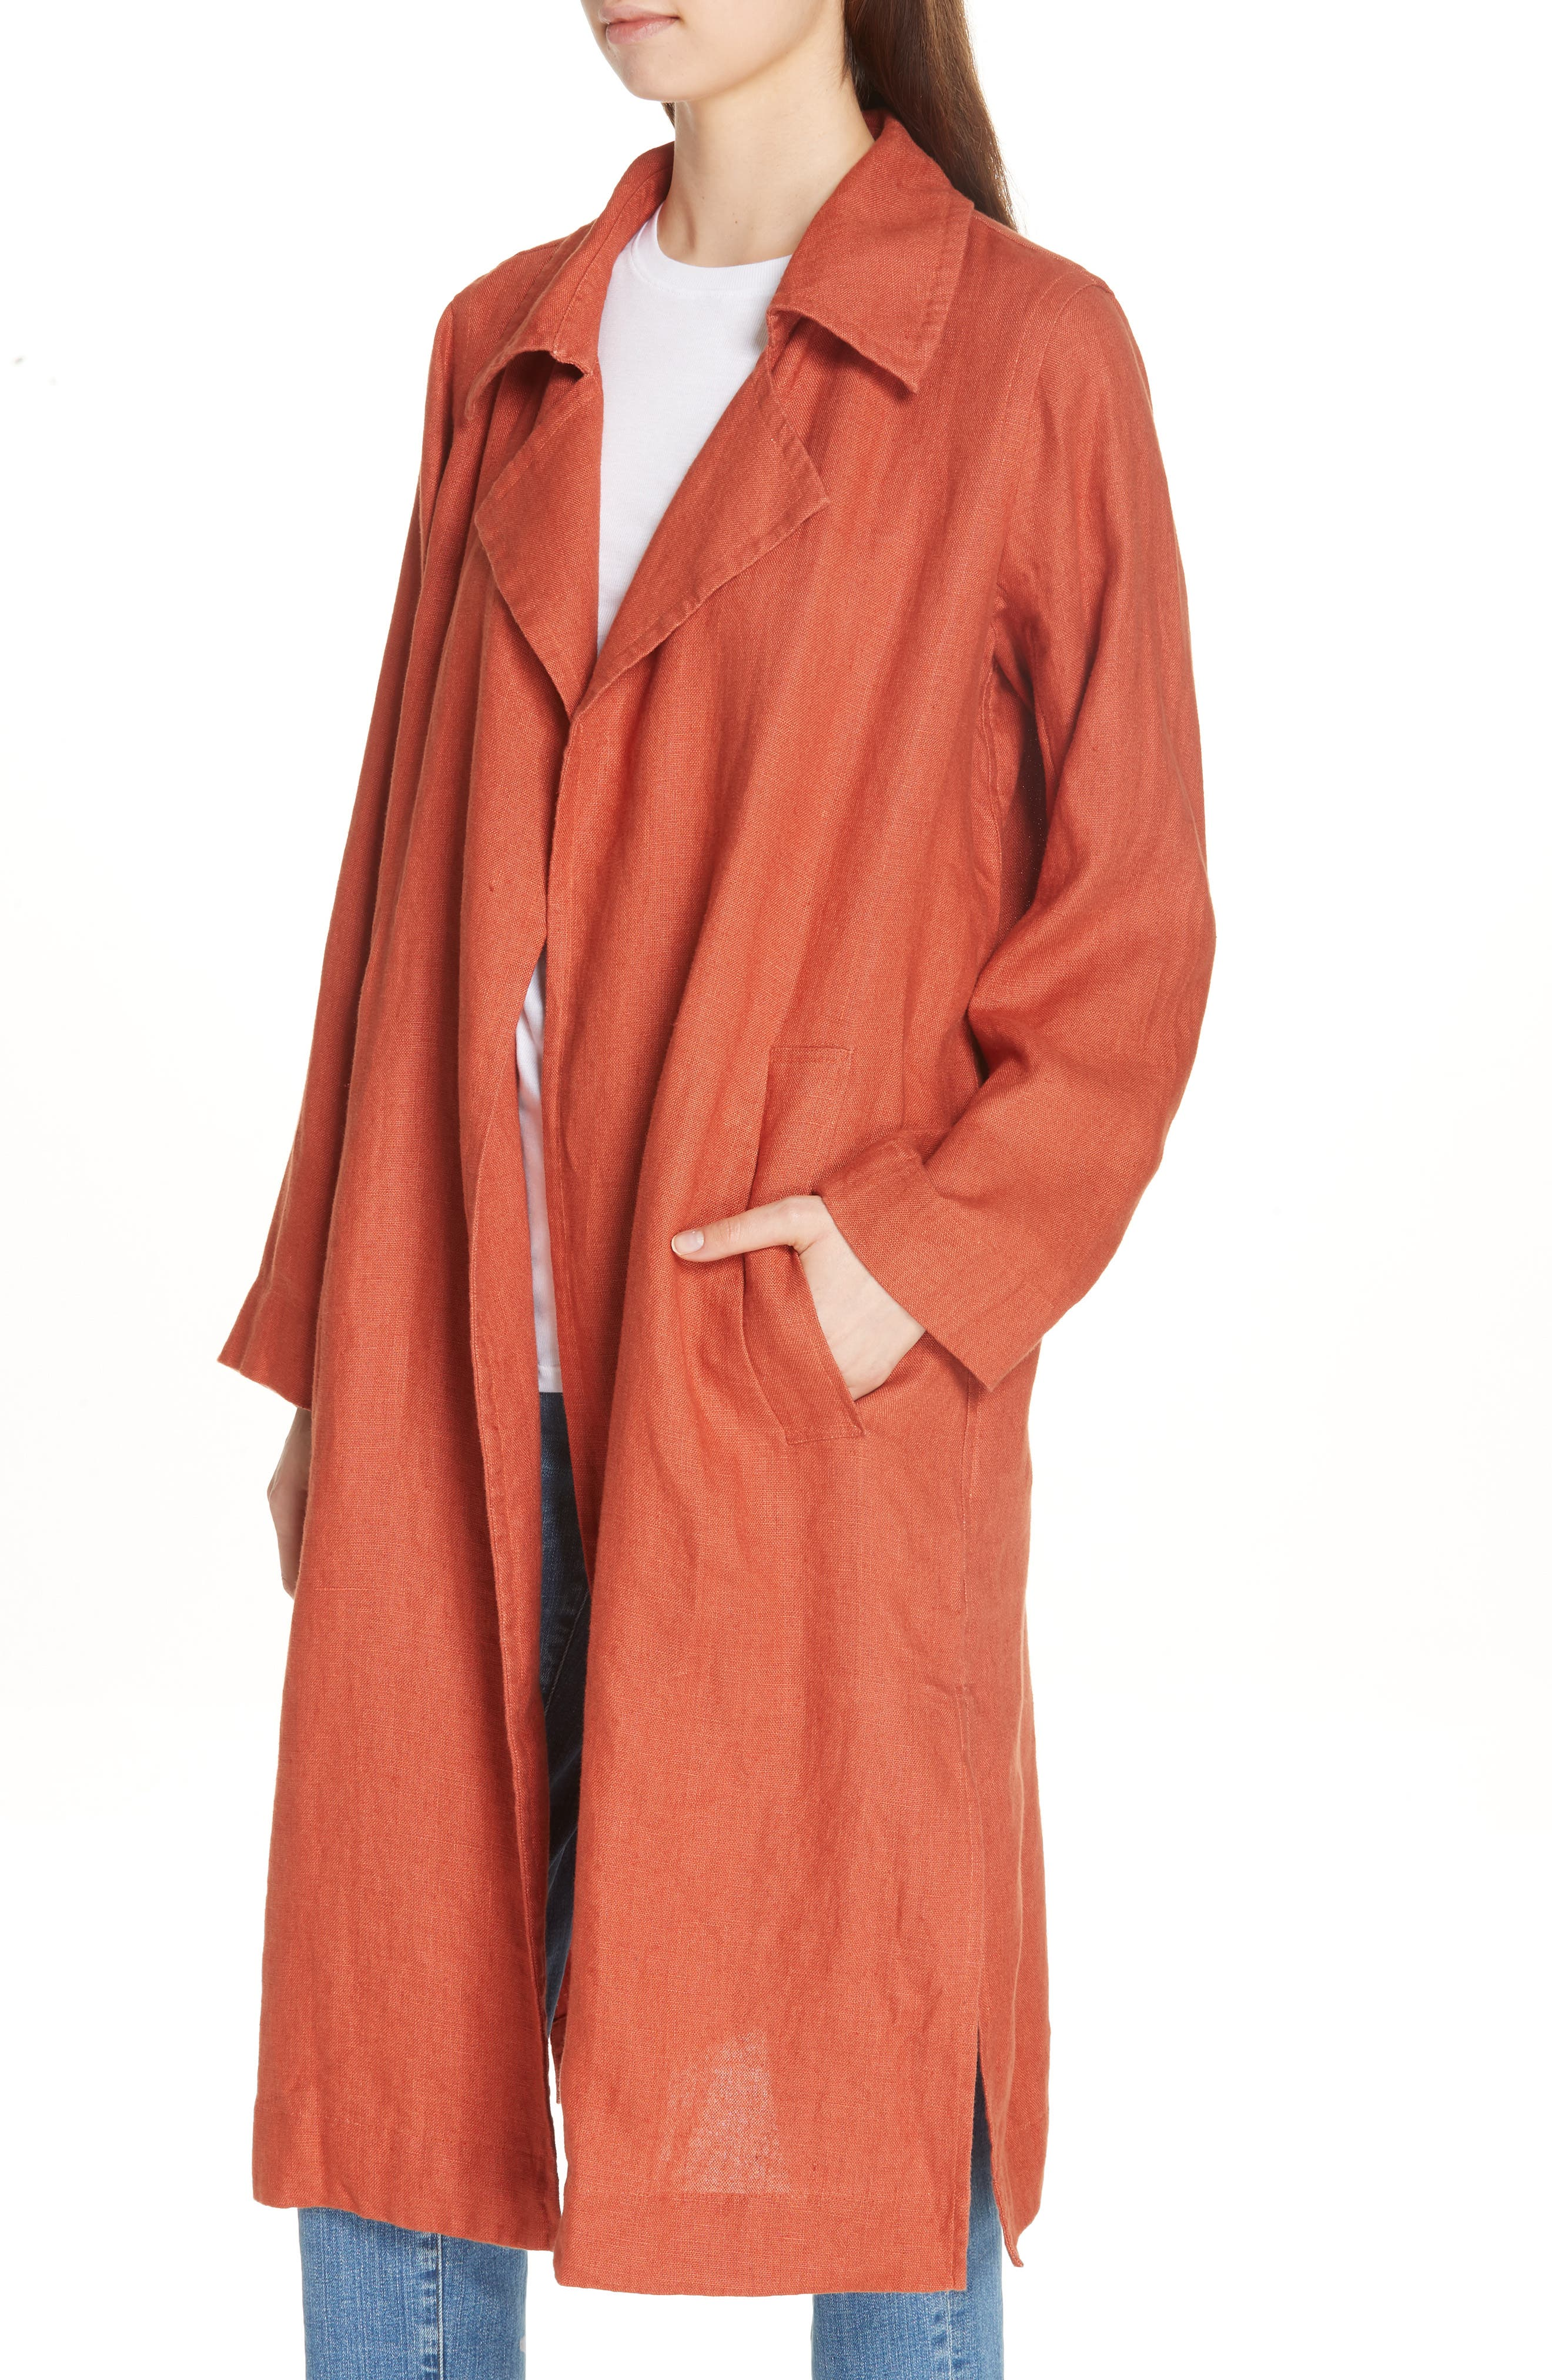 Organic Linen Trench Coat,                             Alternate thumbnail 4, color,                             822